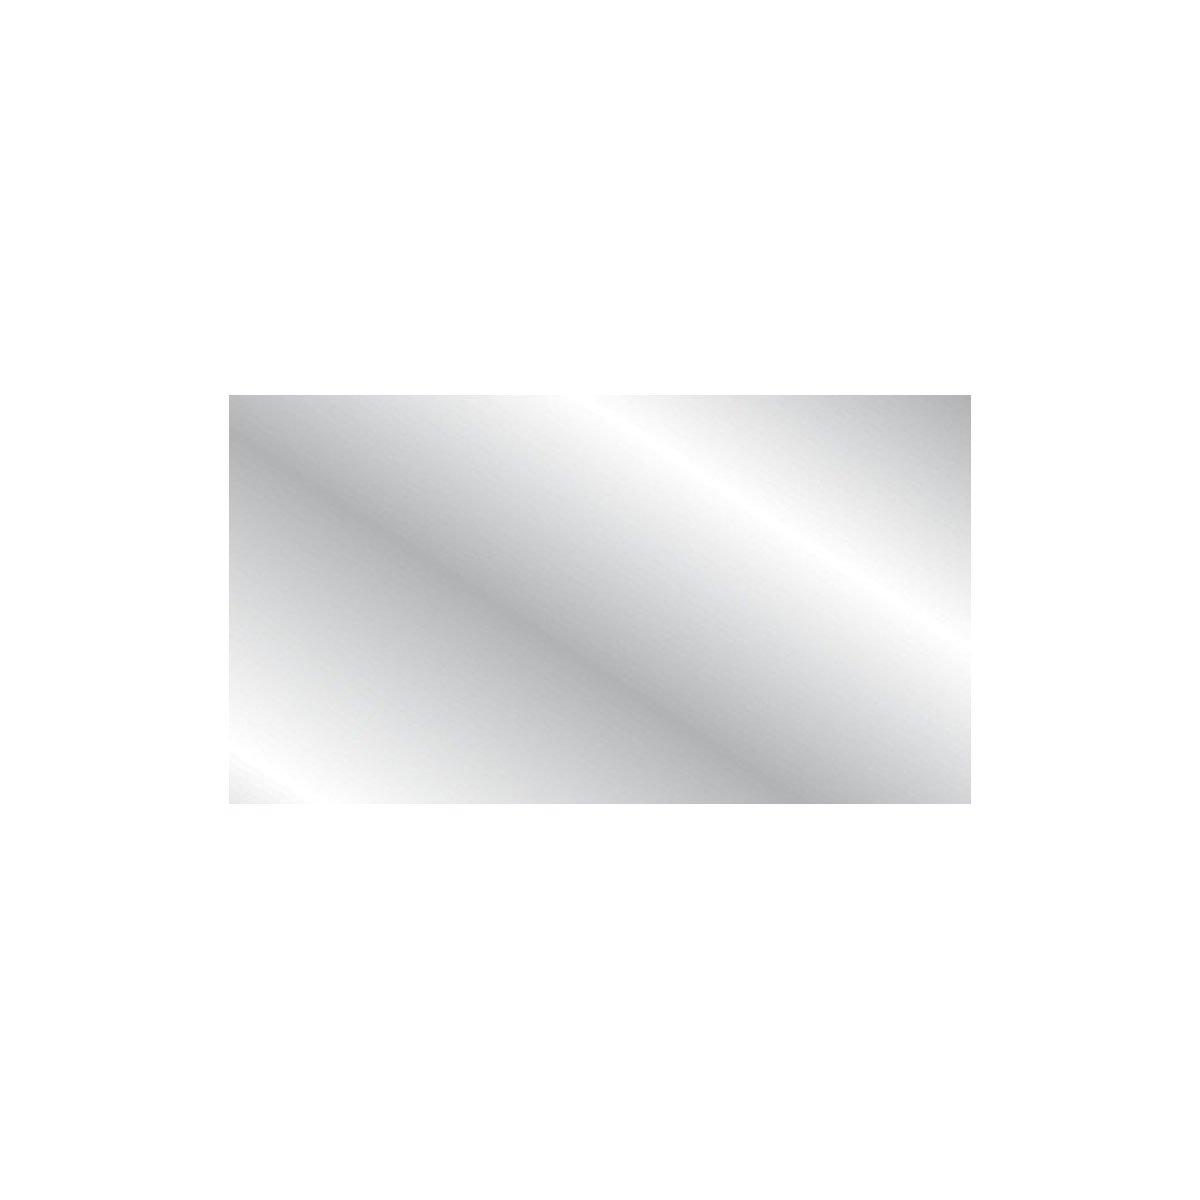 Pilot New-look, pellicola cm 48x60 - Alluminio Lampa LA_02953